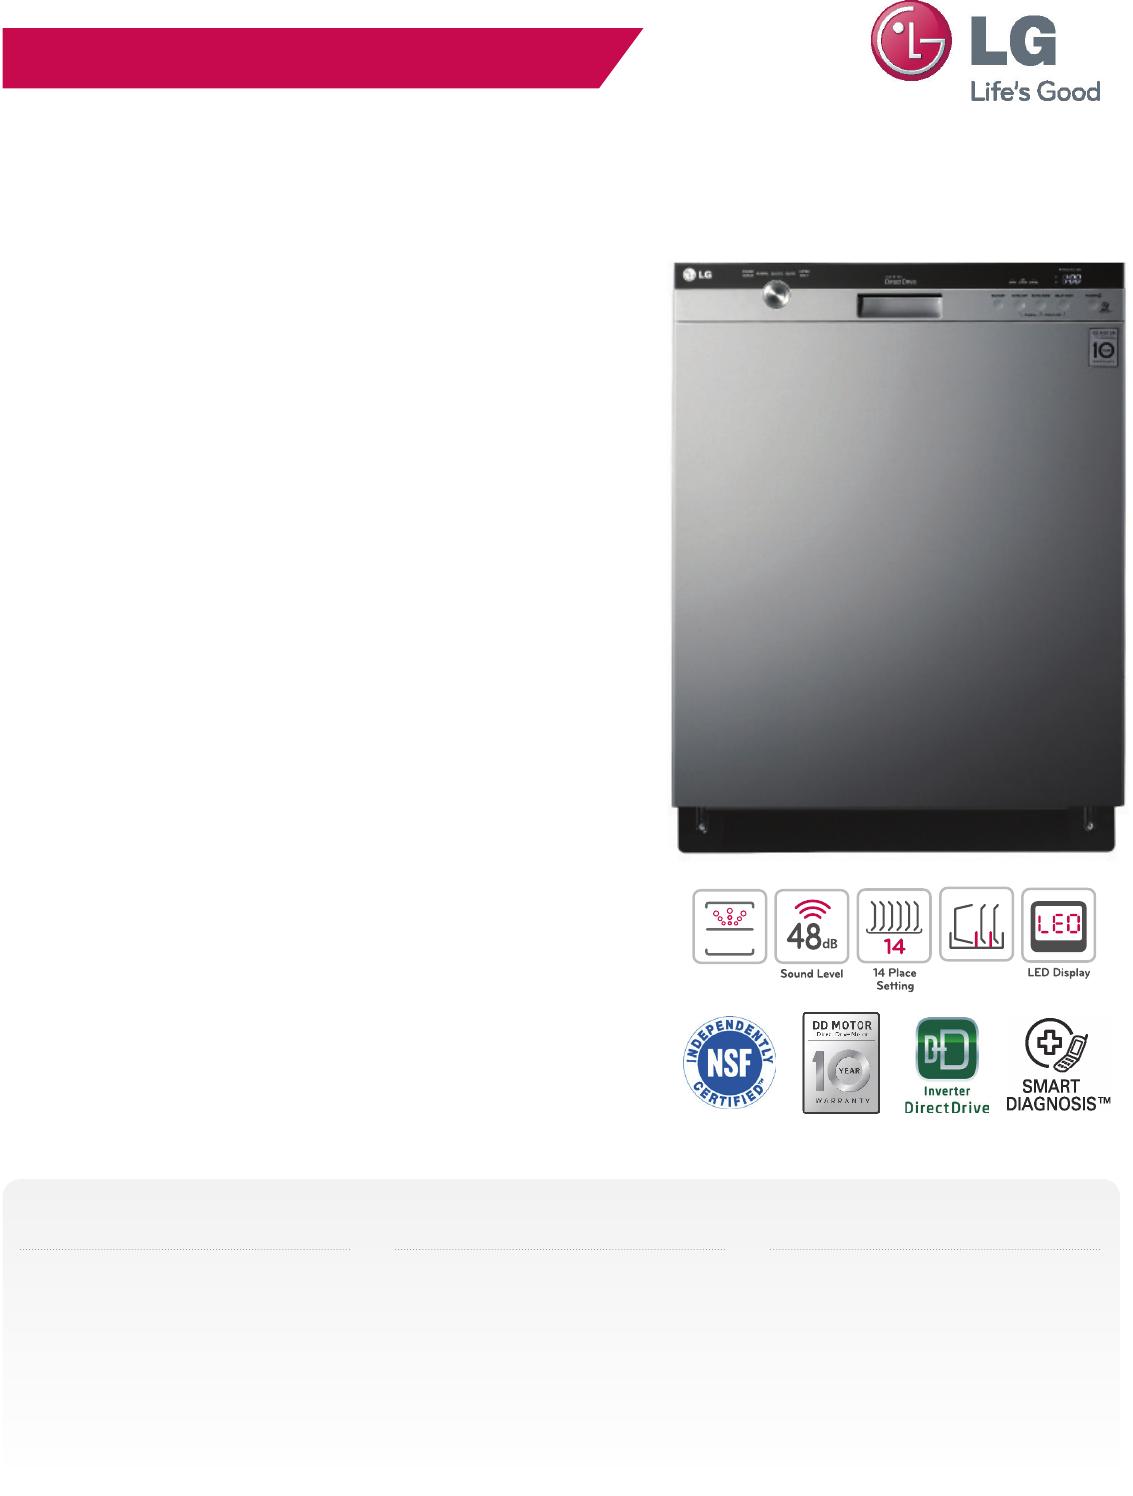 LG LDS5540BB User Manual Specification LDS5540 Spec Sheet